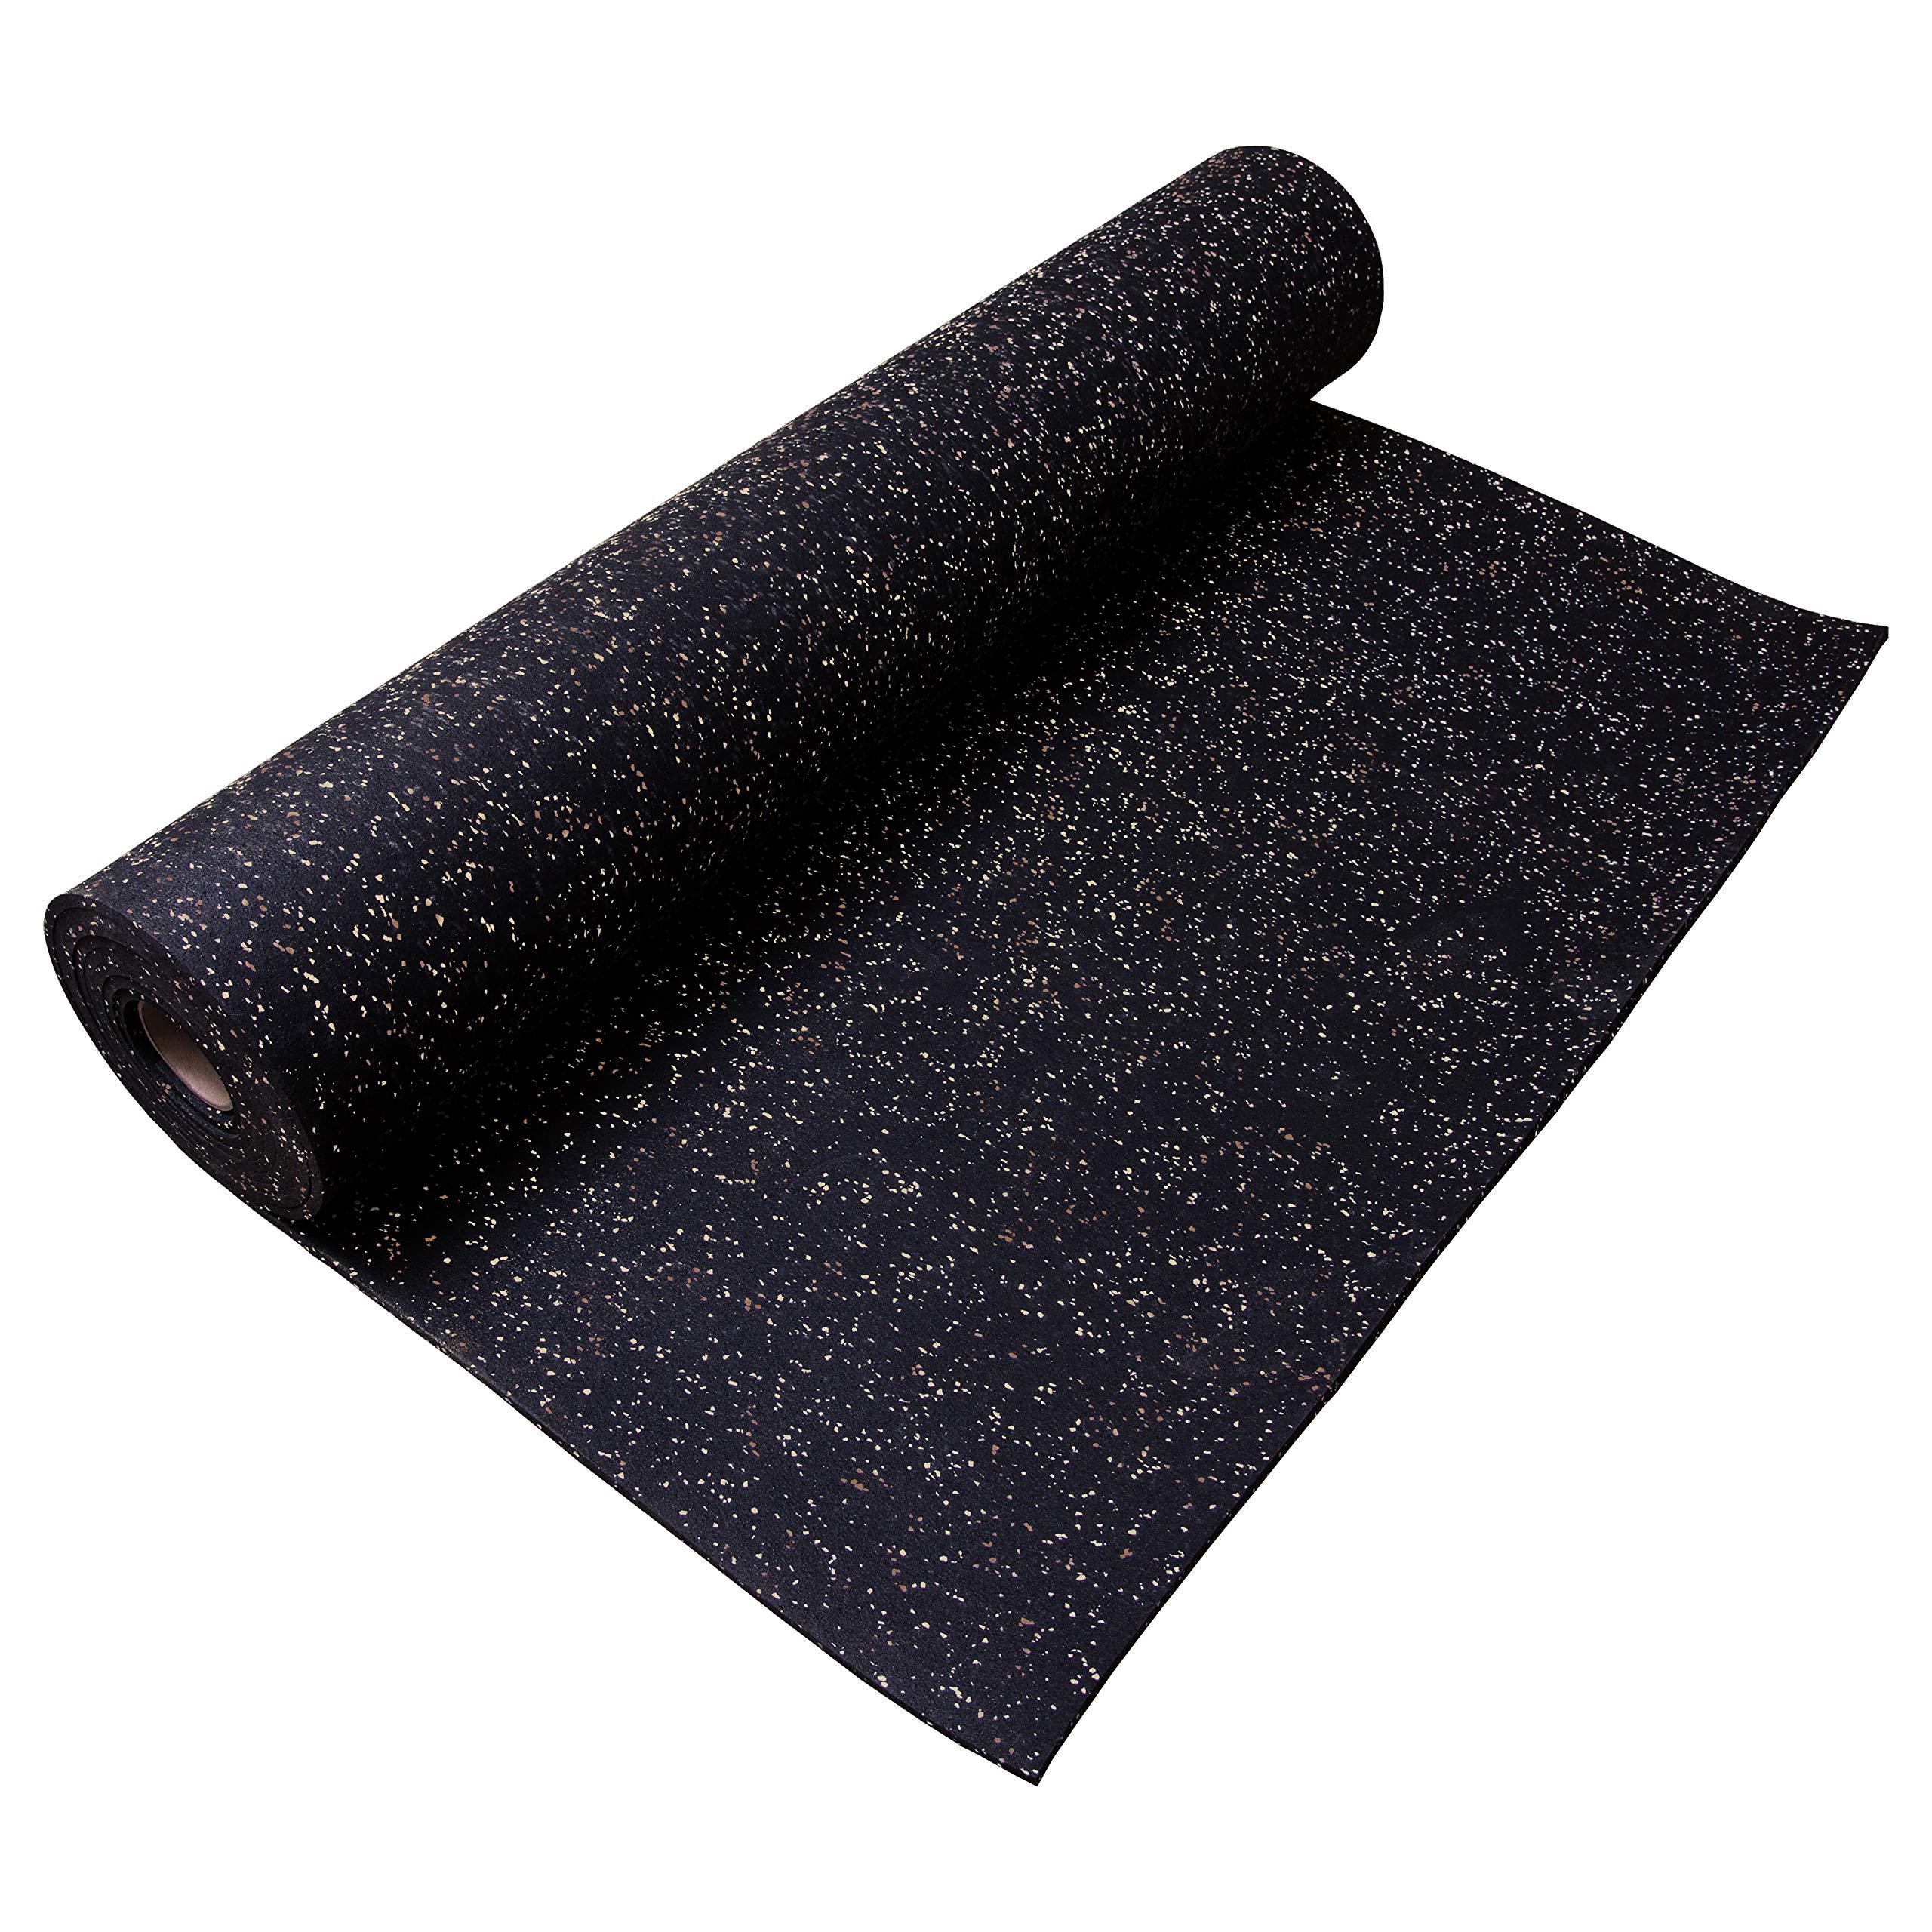 "IncStores 3/8"" Heavy Duty Gym Flooring Rubber Rolls (Brown/Tan, 40 sqft, 4' x 10')"